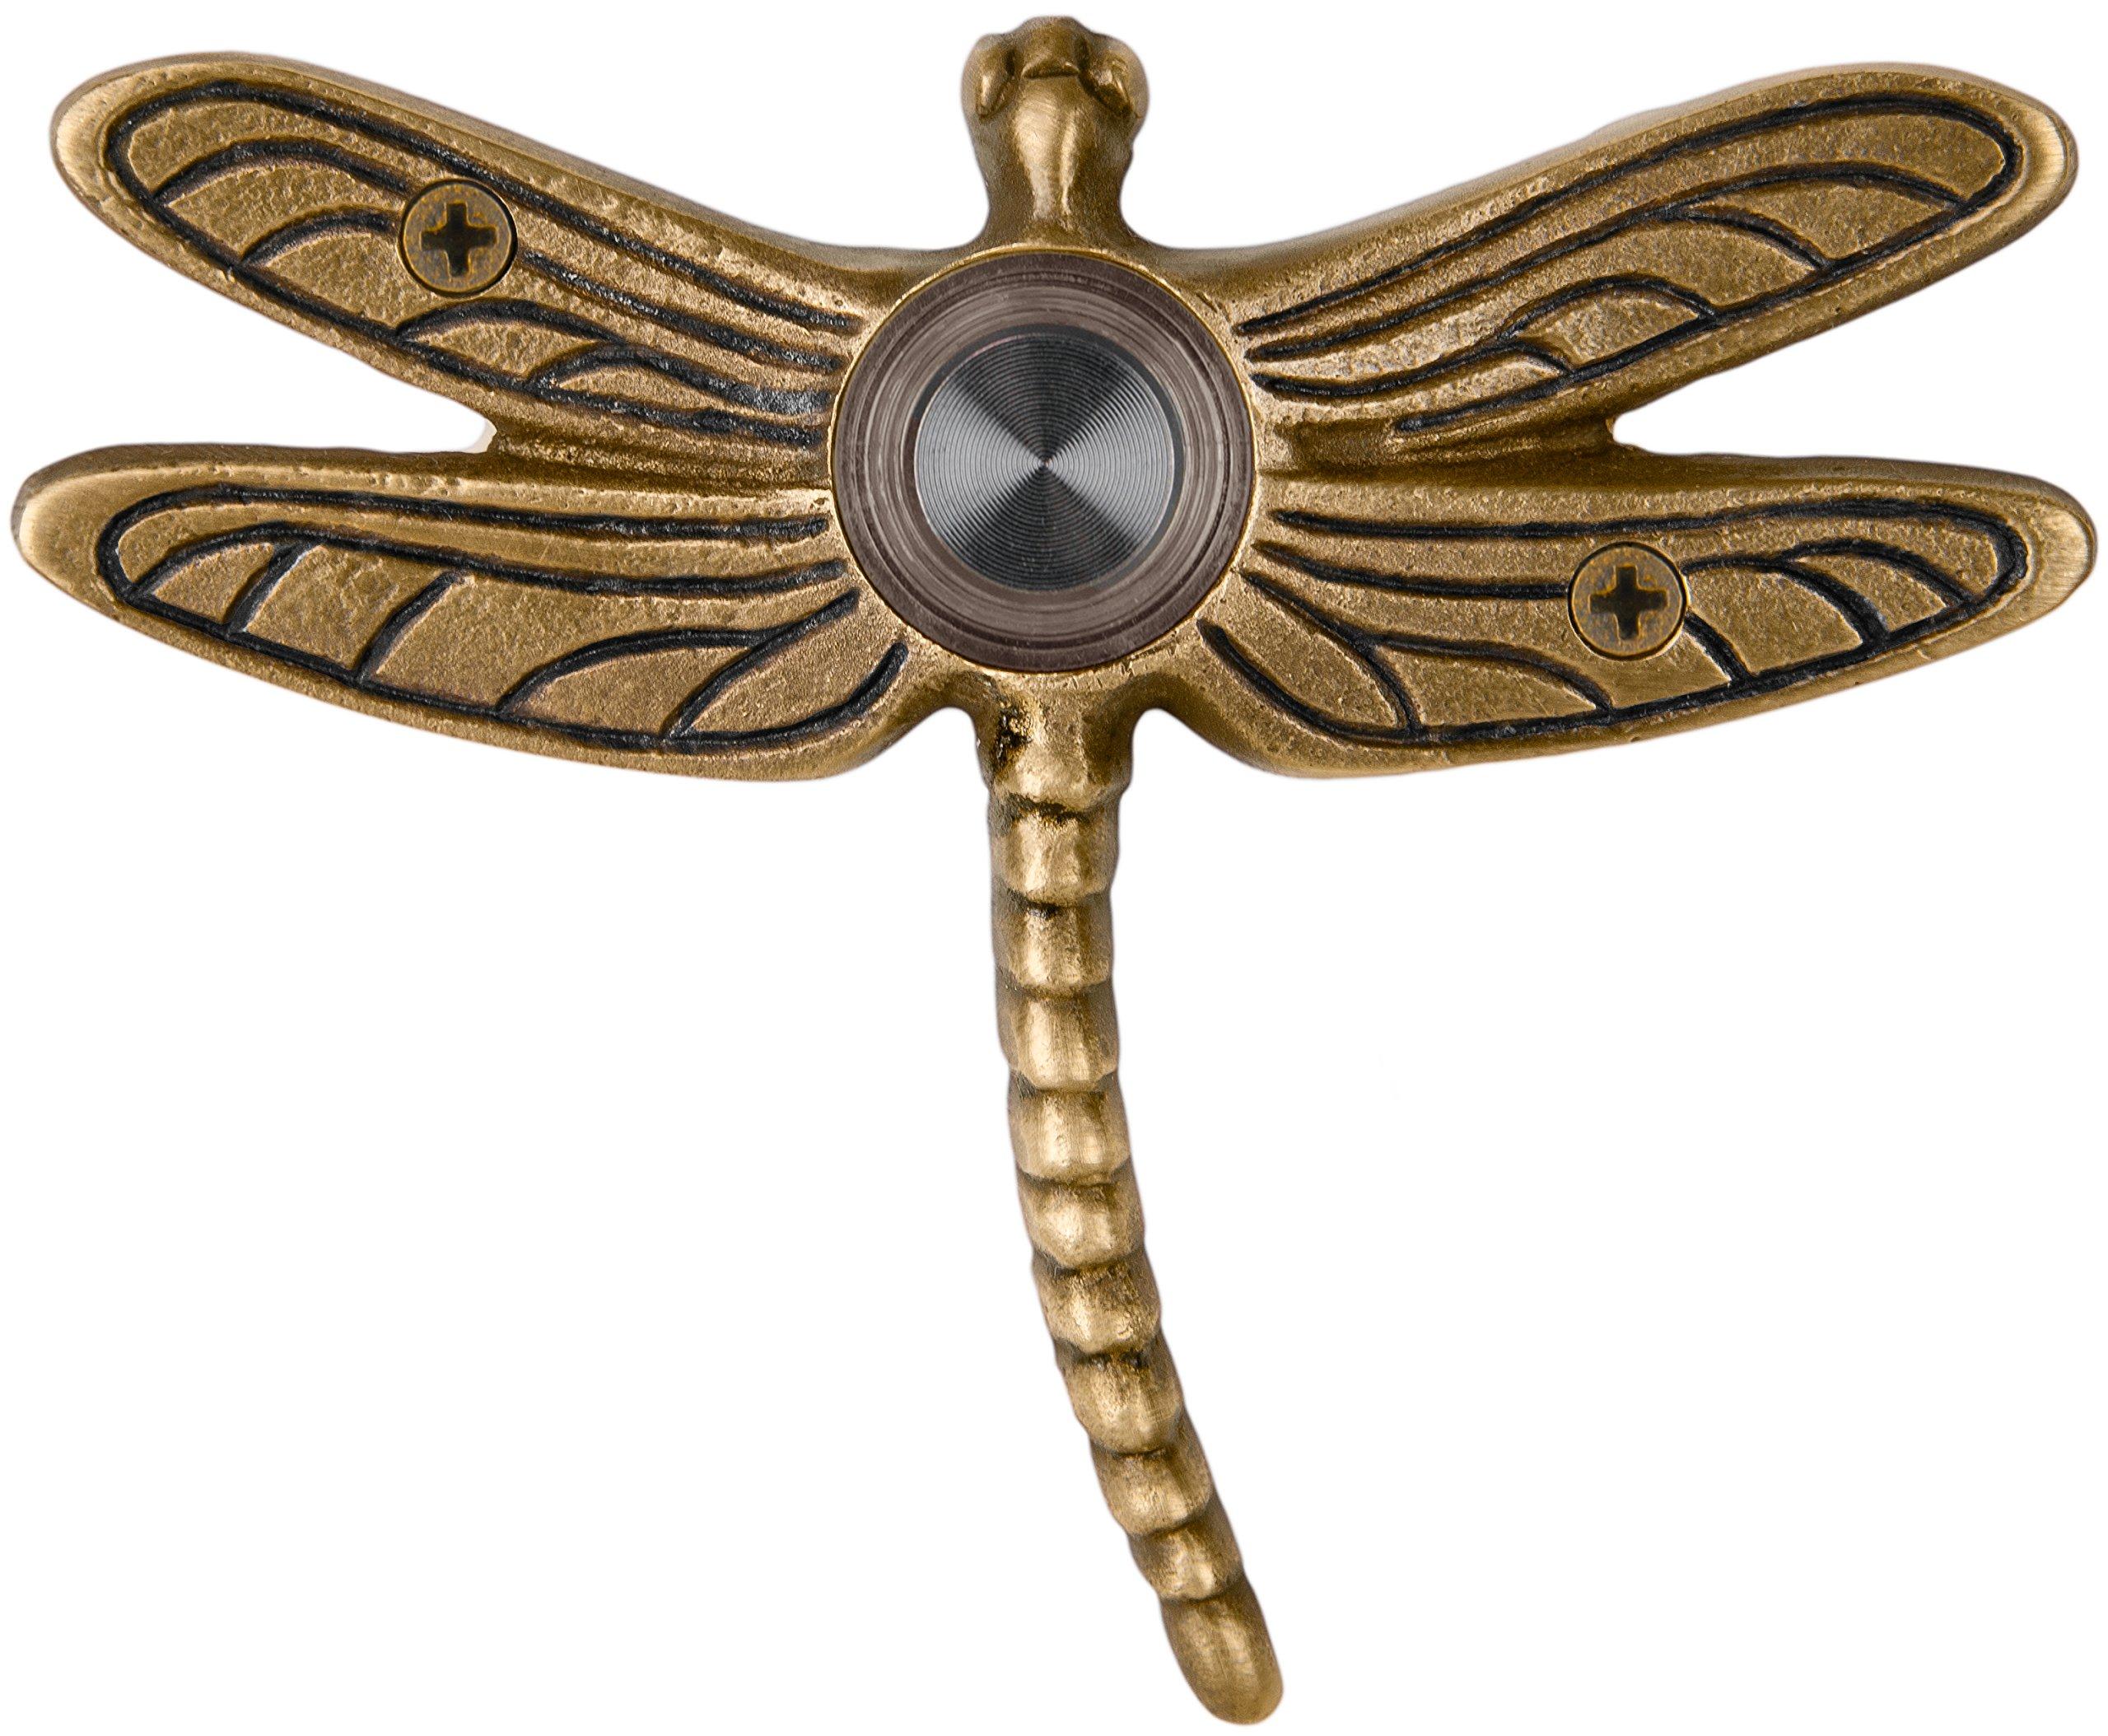 Waterwood Solid Brass Summer Dragonfly Doorbell in Antique Brass